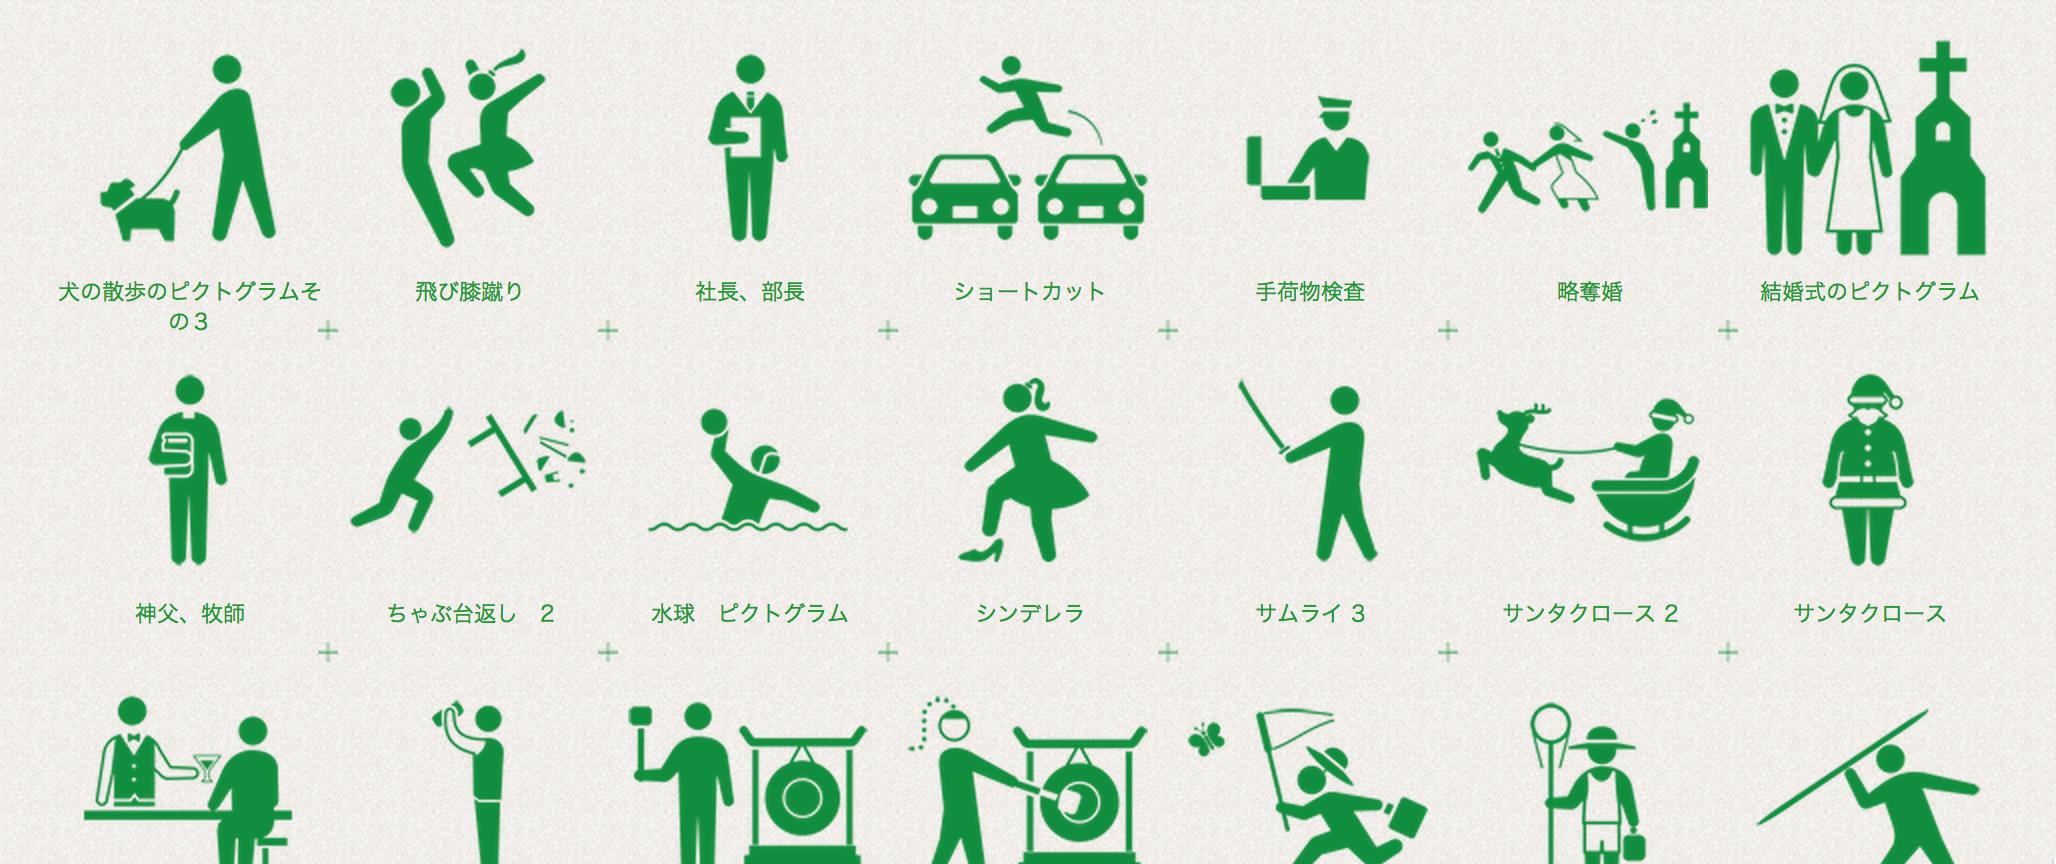 Cursor_と_human_pictogram_2_0__無料人物_ピクトグラム素材_2_0_